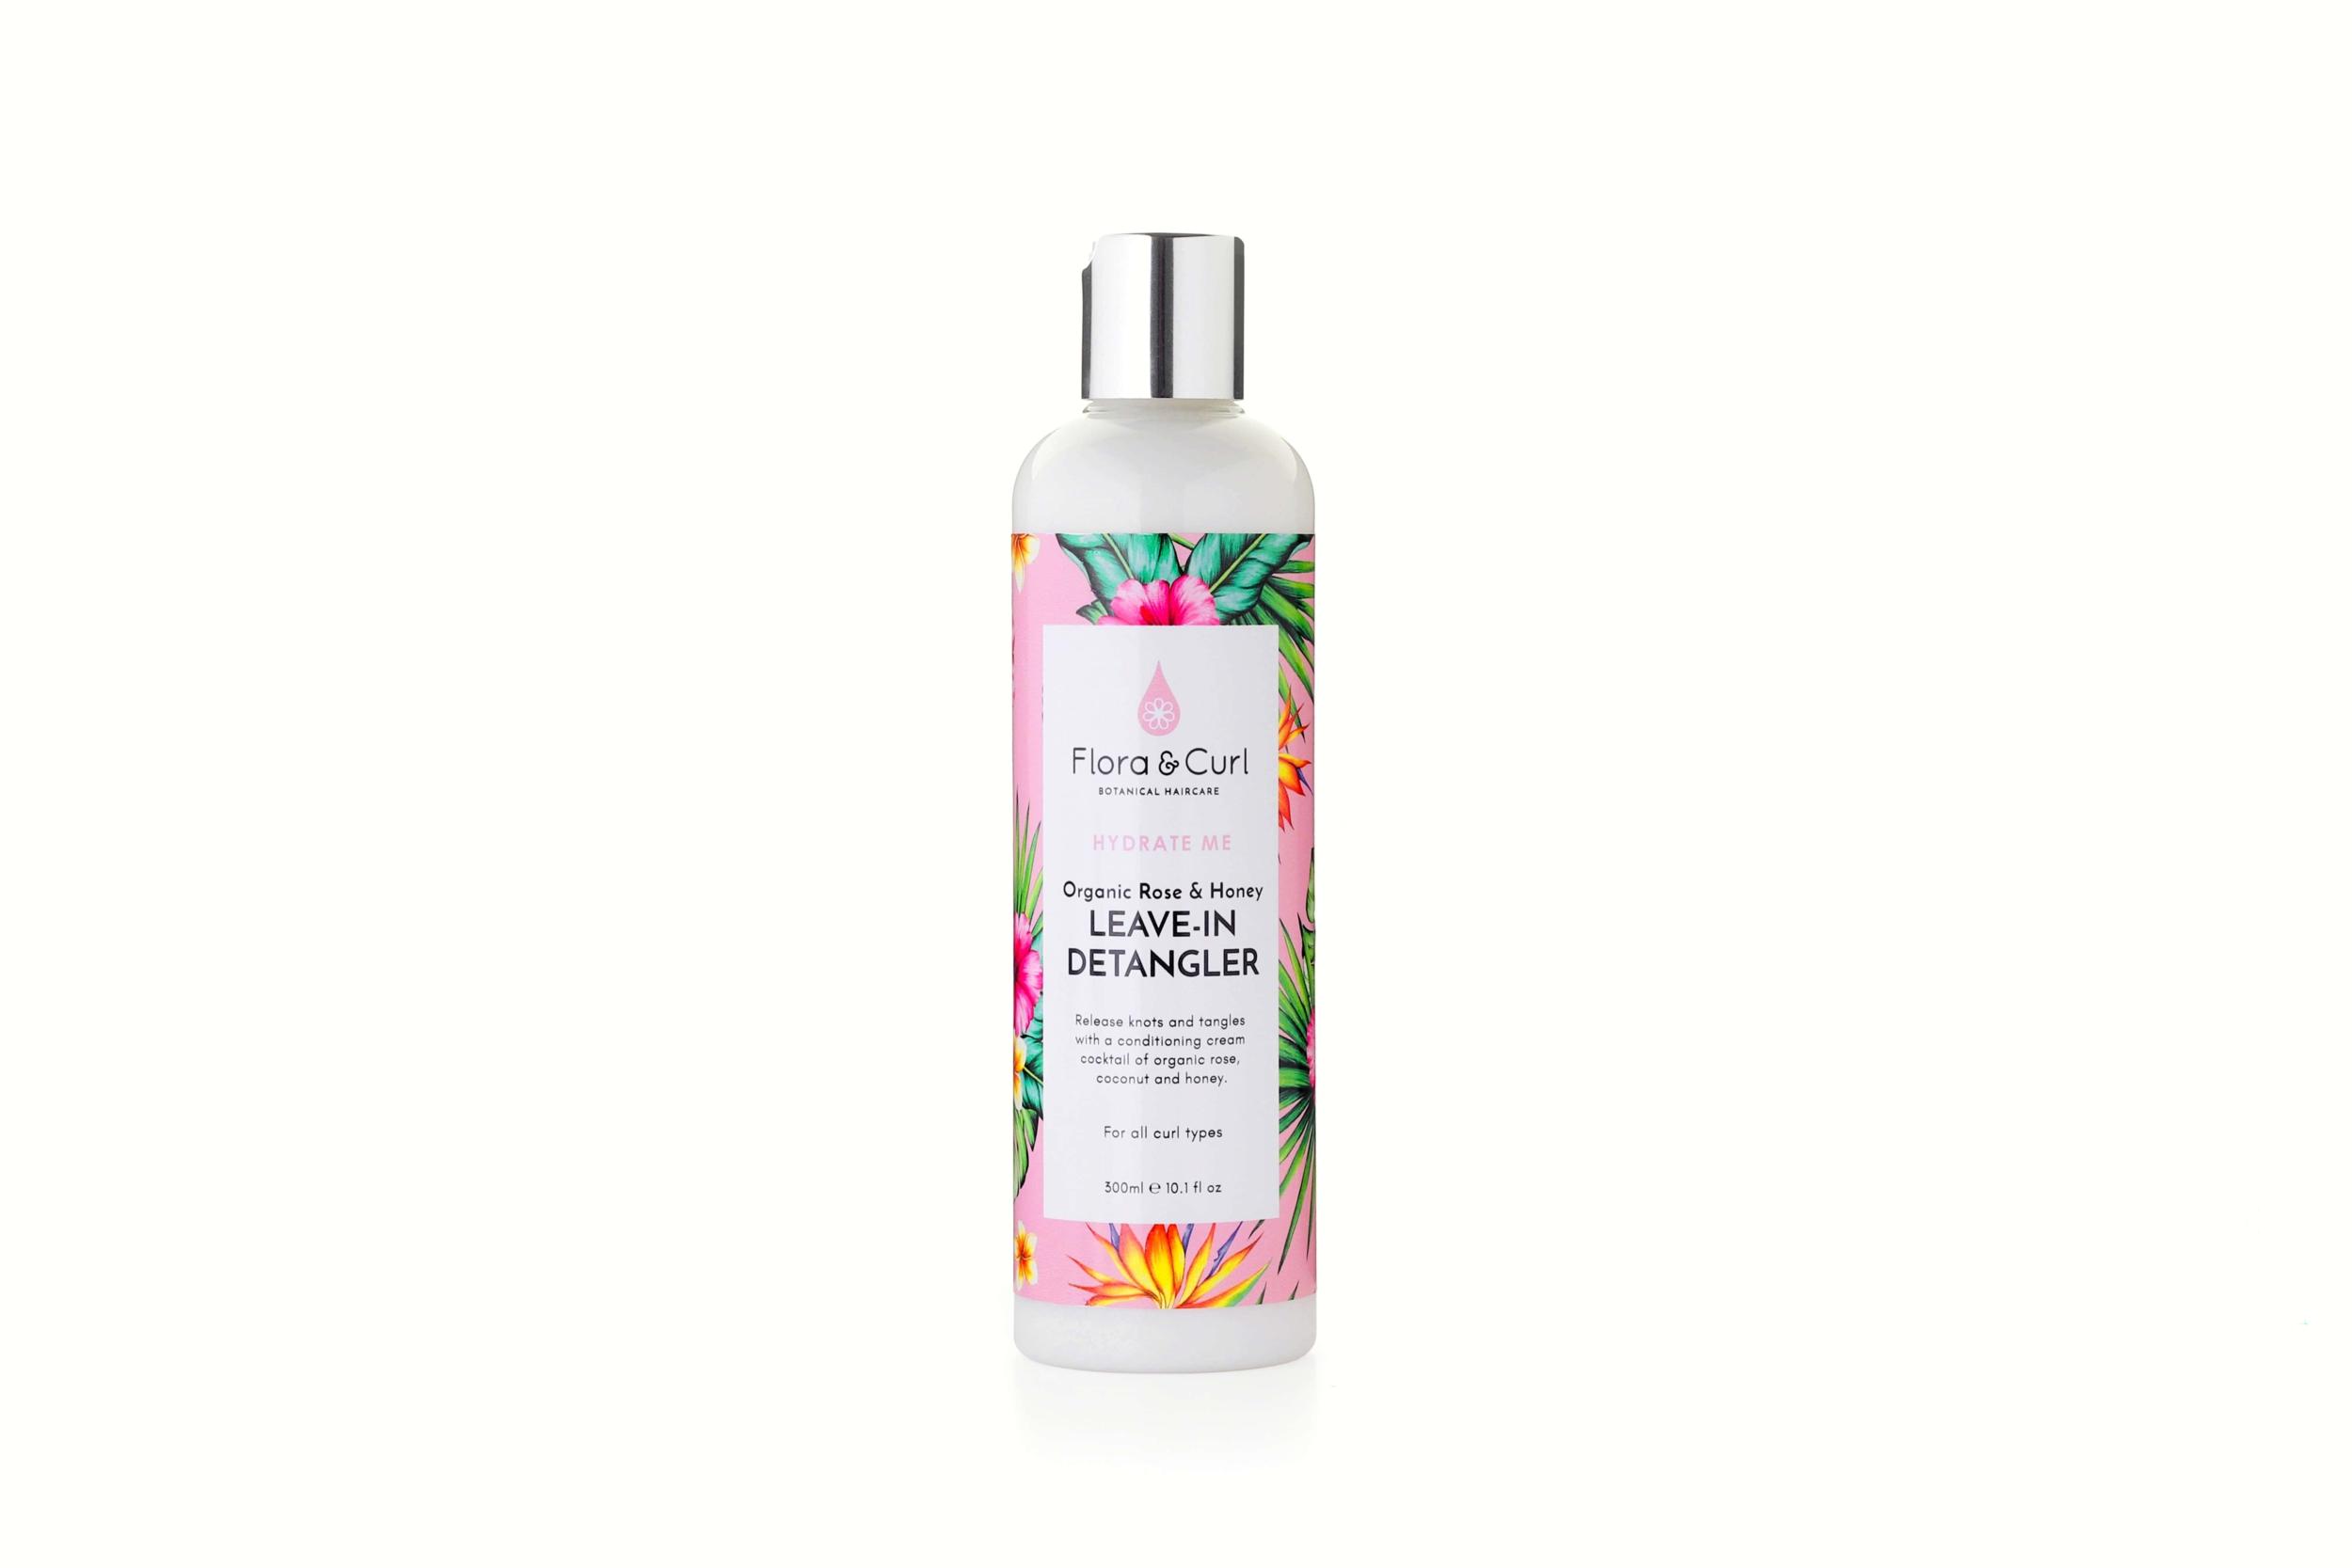 Organic Rose & Honey Leave-in Detangler  - Flora & Curl